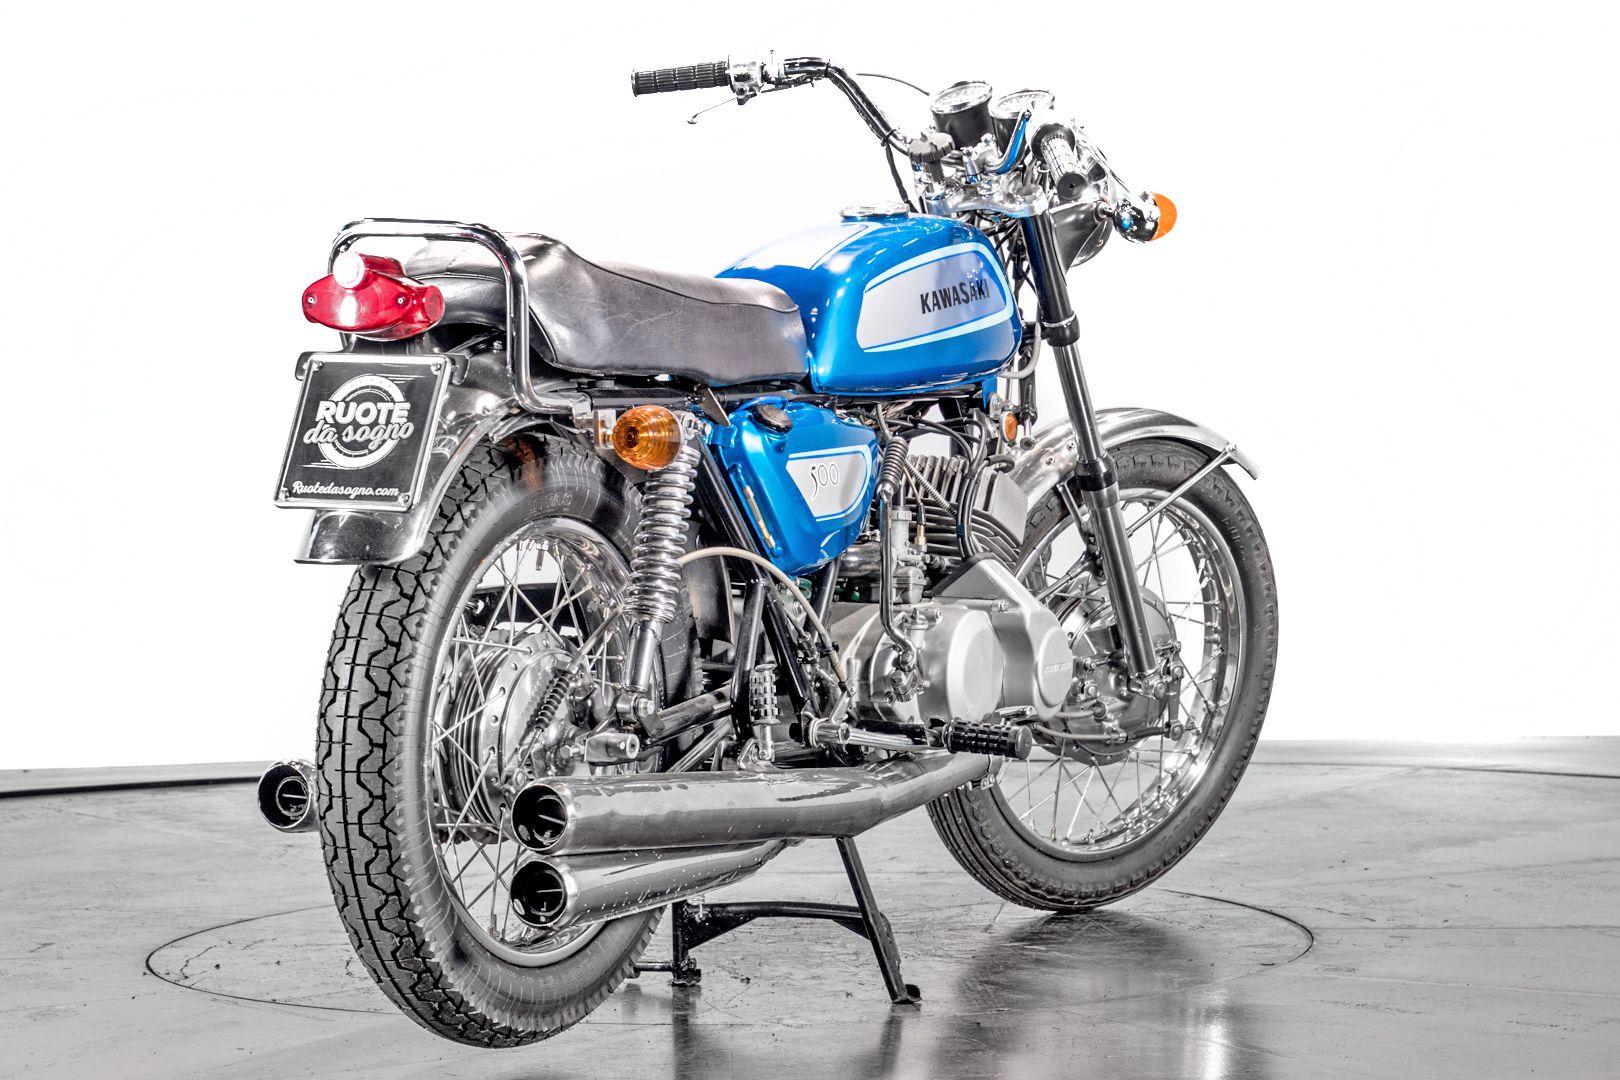 1971 Kawasaki 500 Mach III 71717